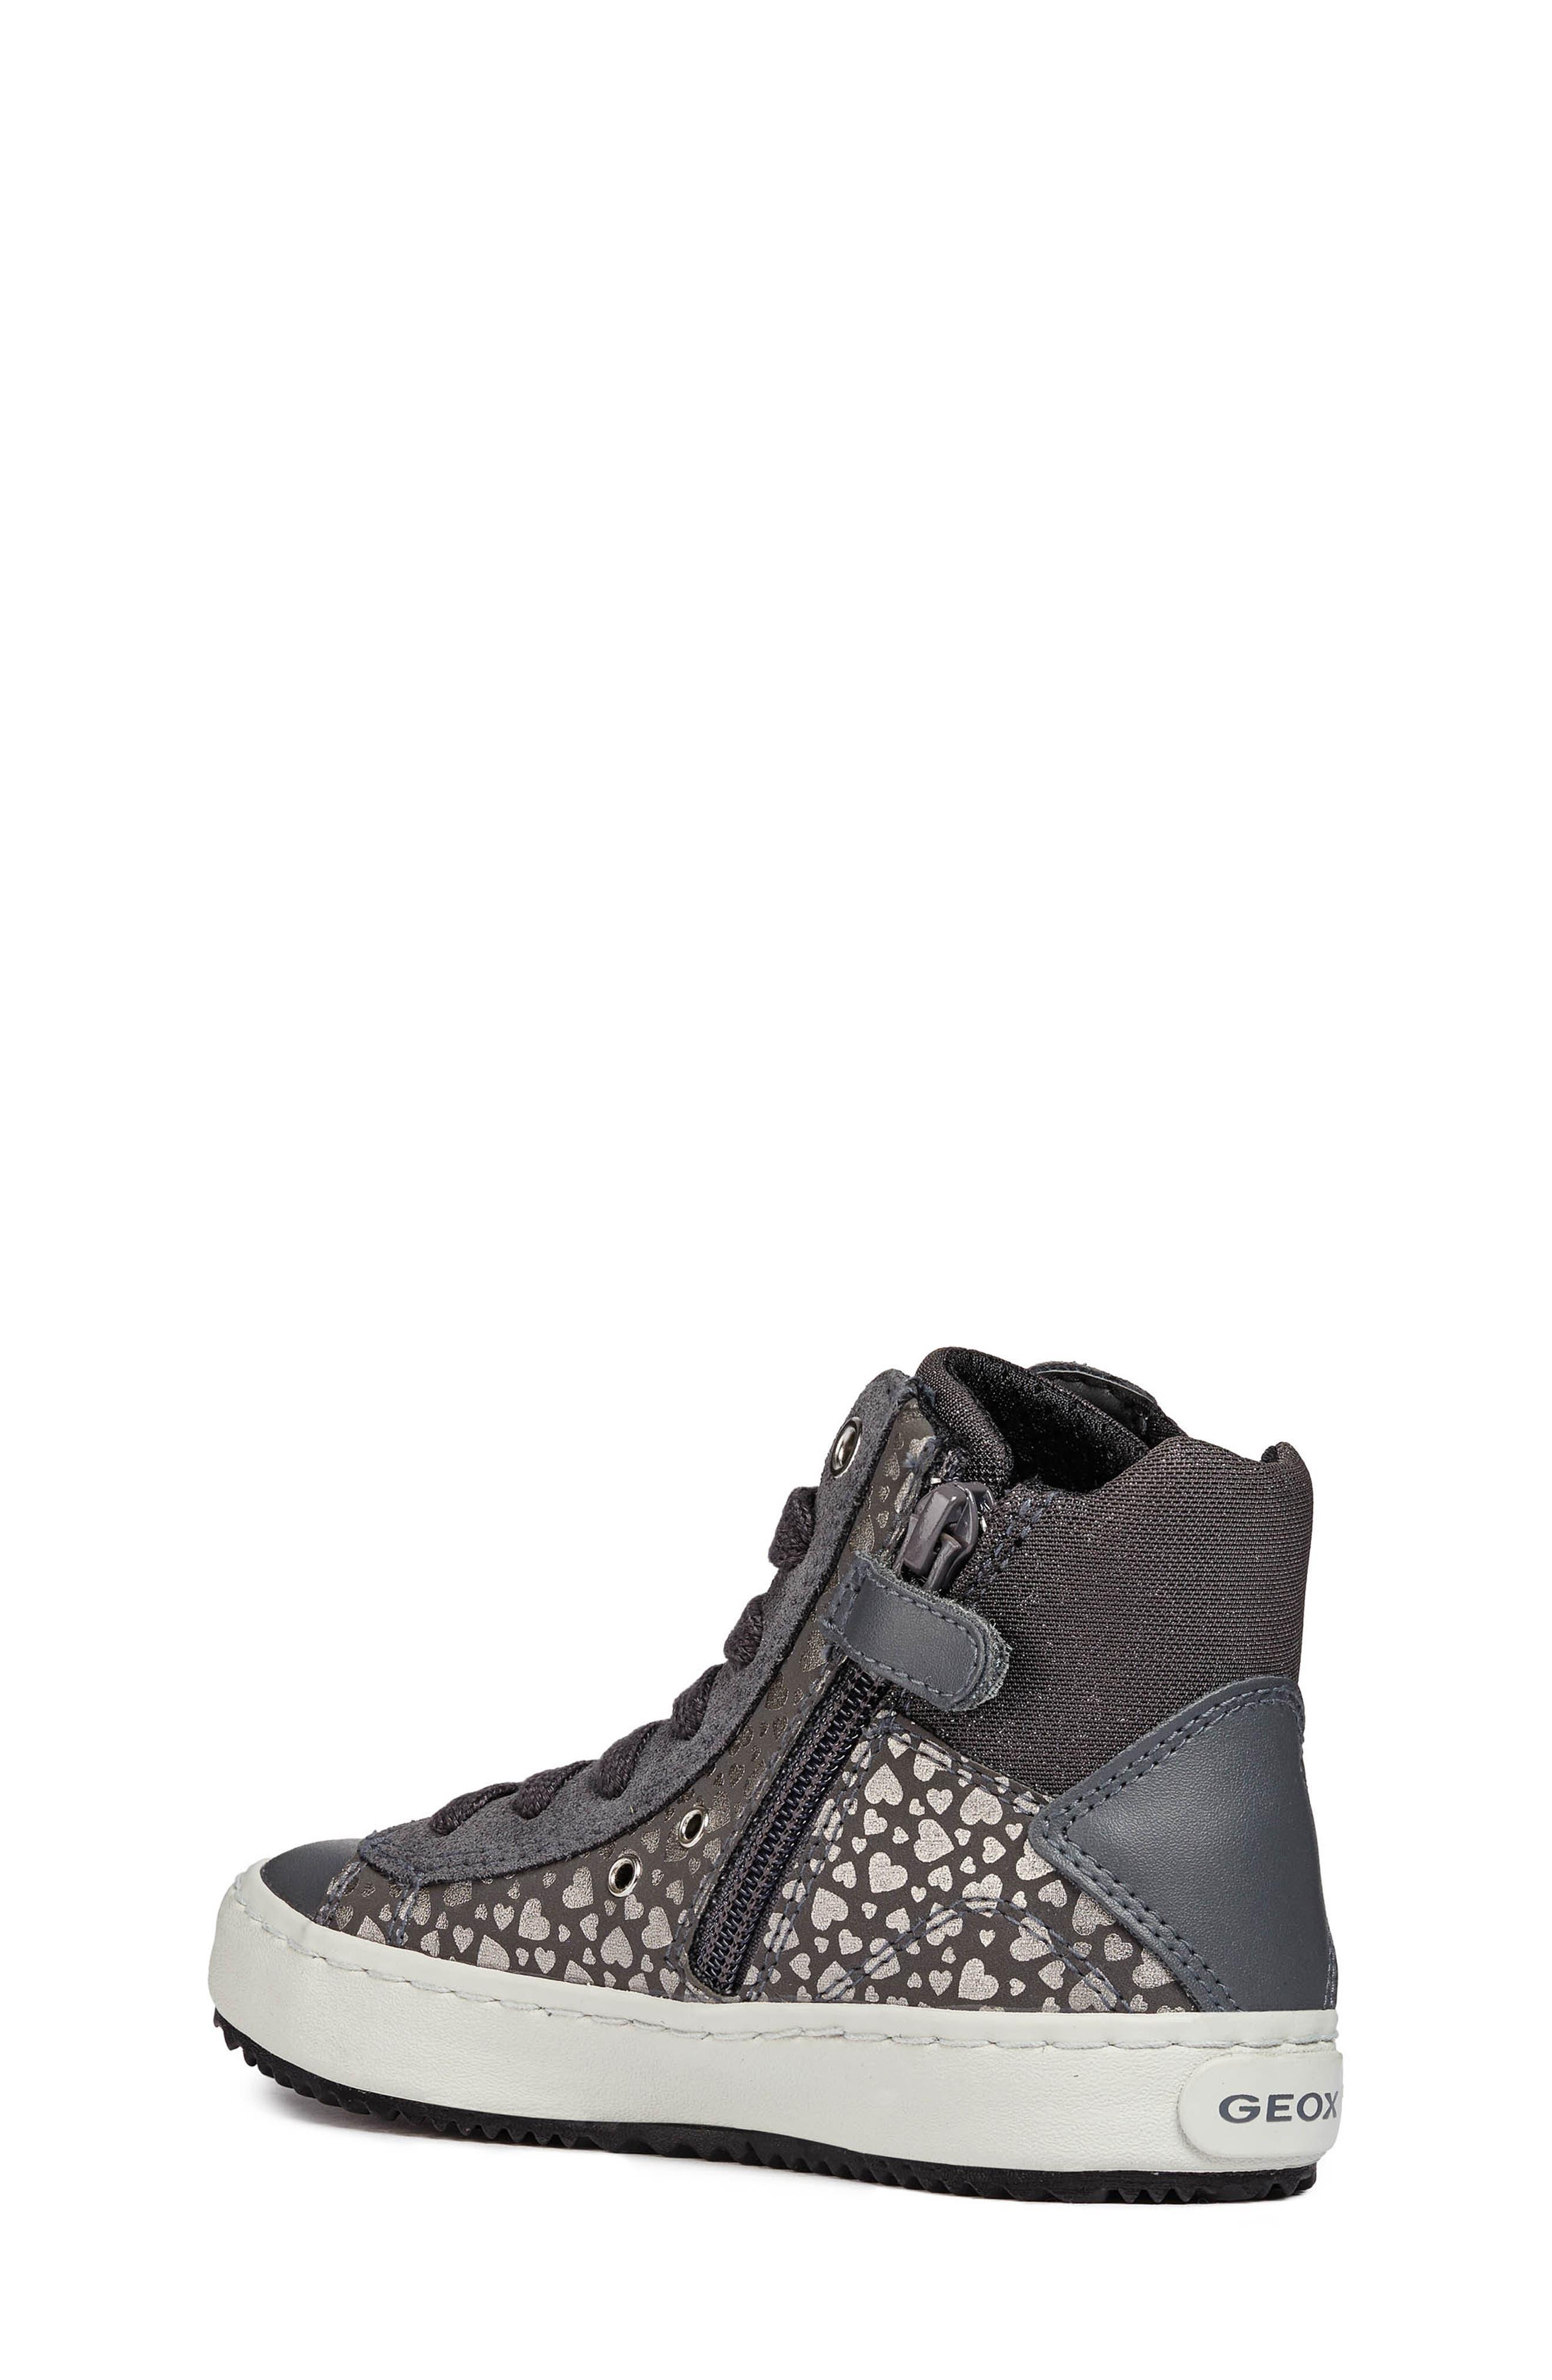 Kalispera High Top Sneaker,                             Alternate thumbnail 2, color,                             DARK GREY